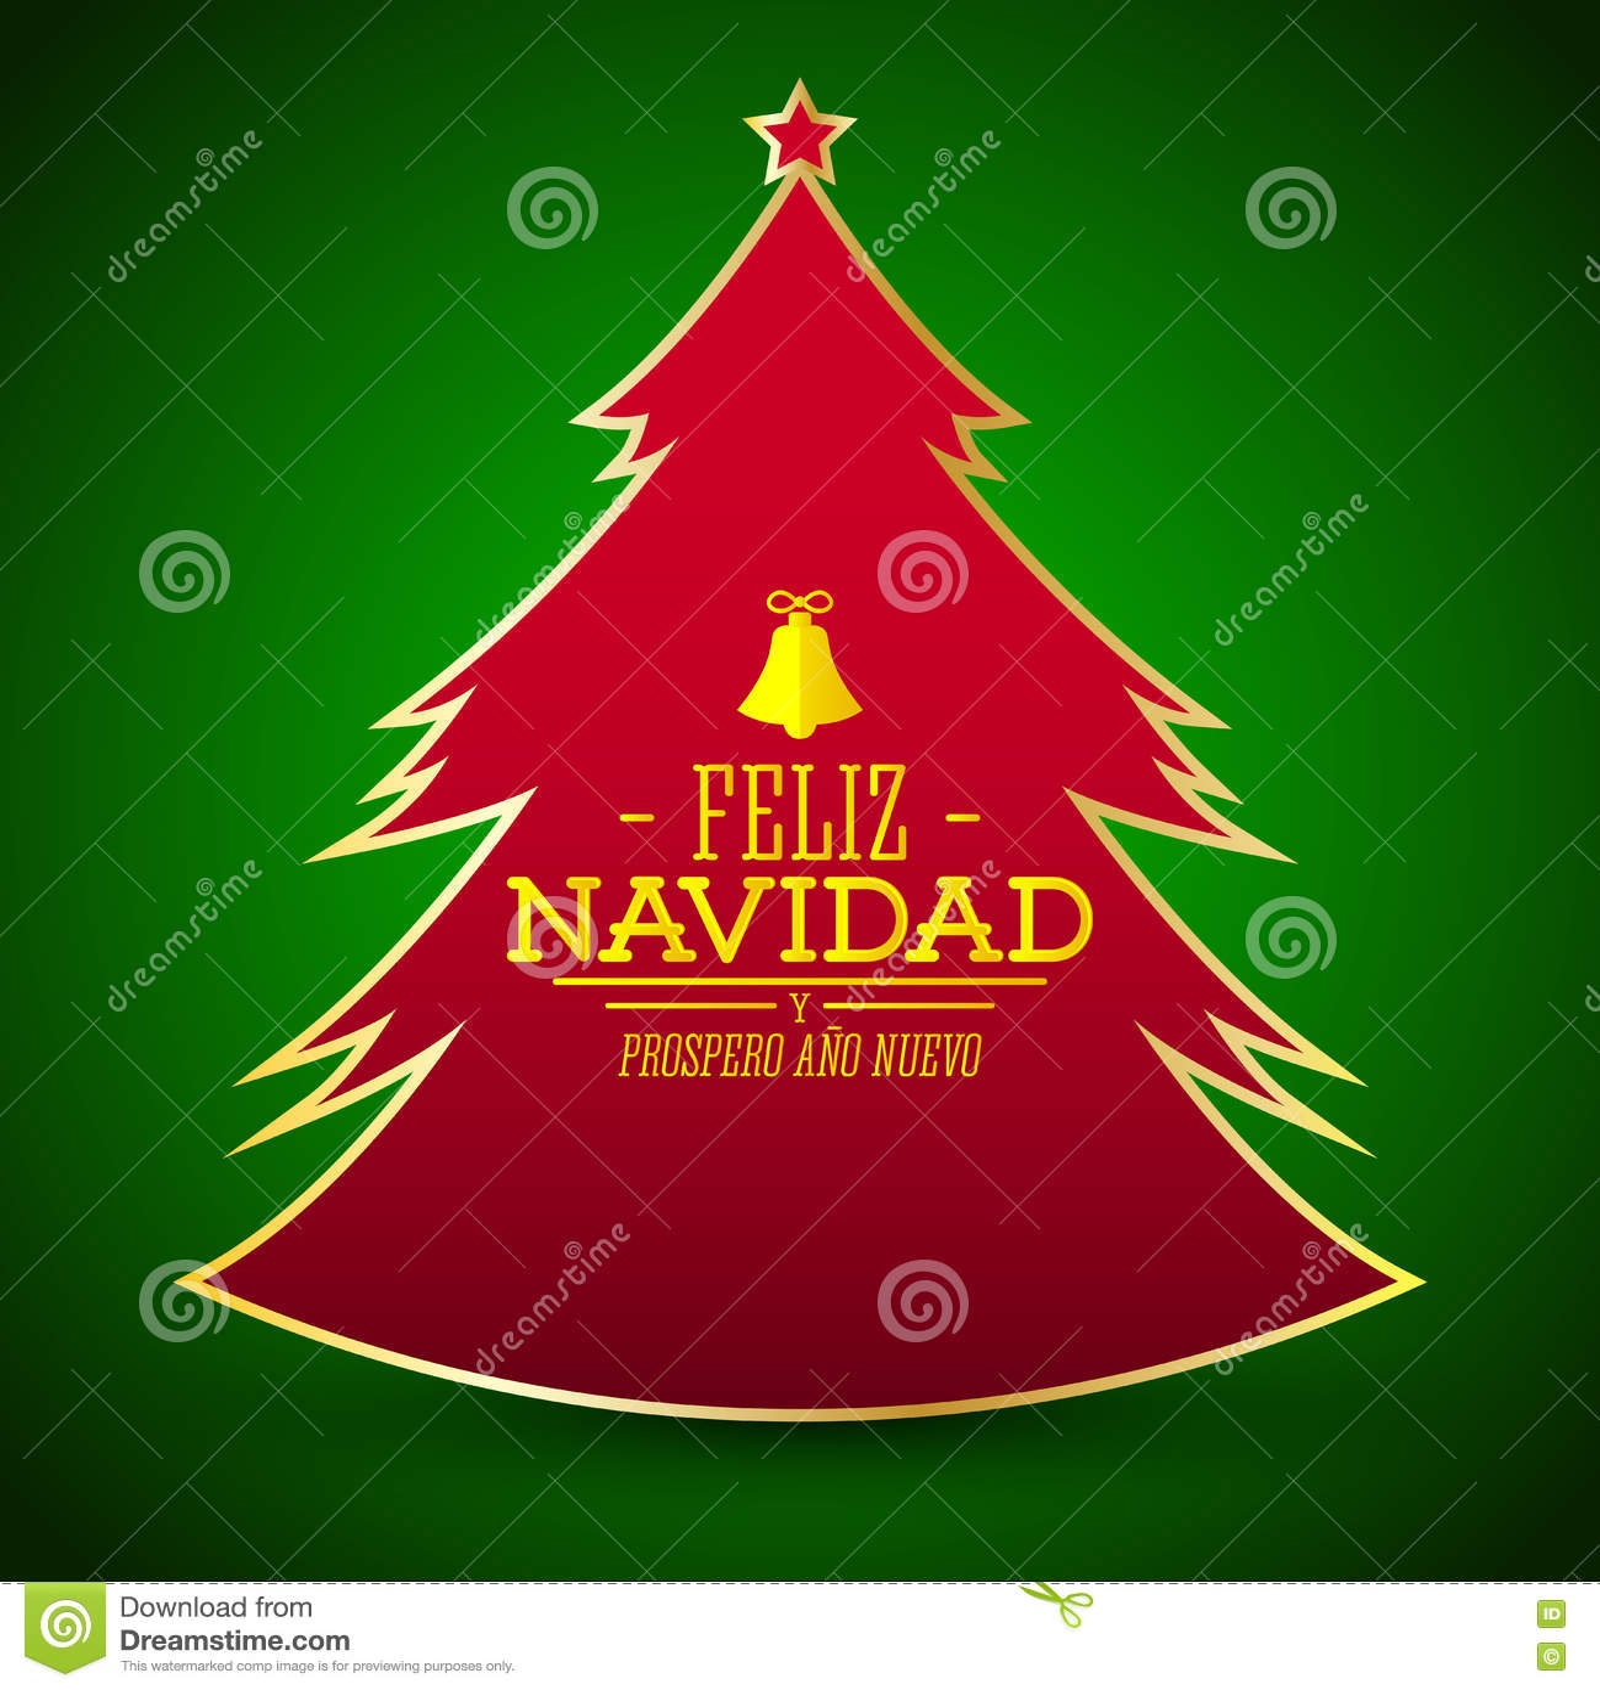 feliz navidad y prospero ano nuevo spanish translation merry